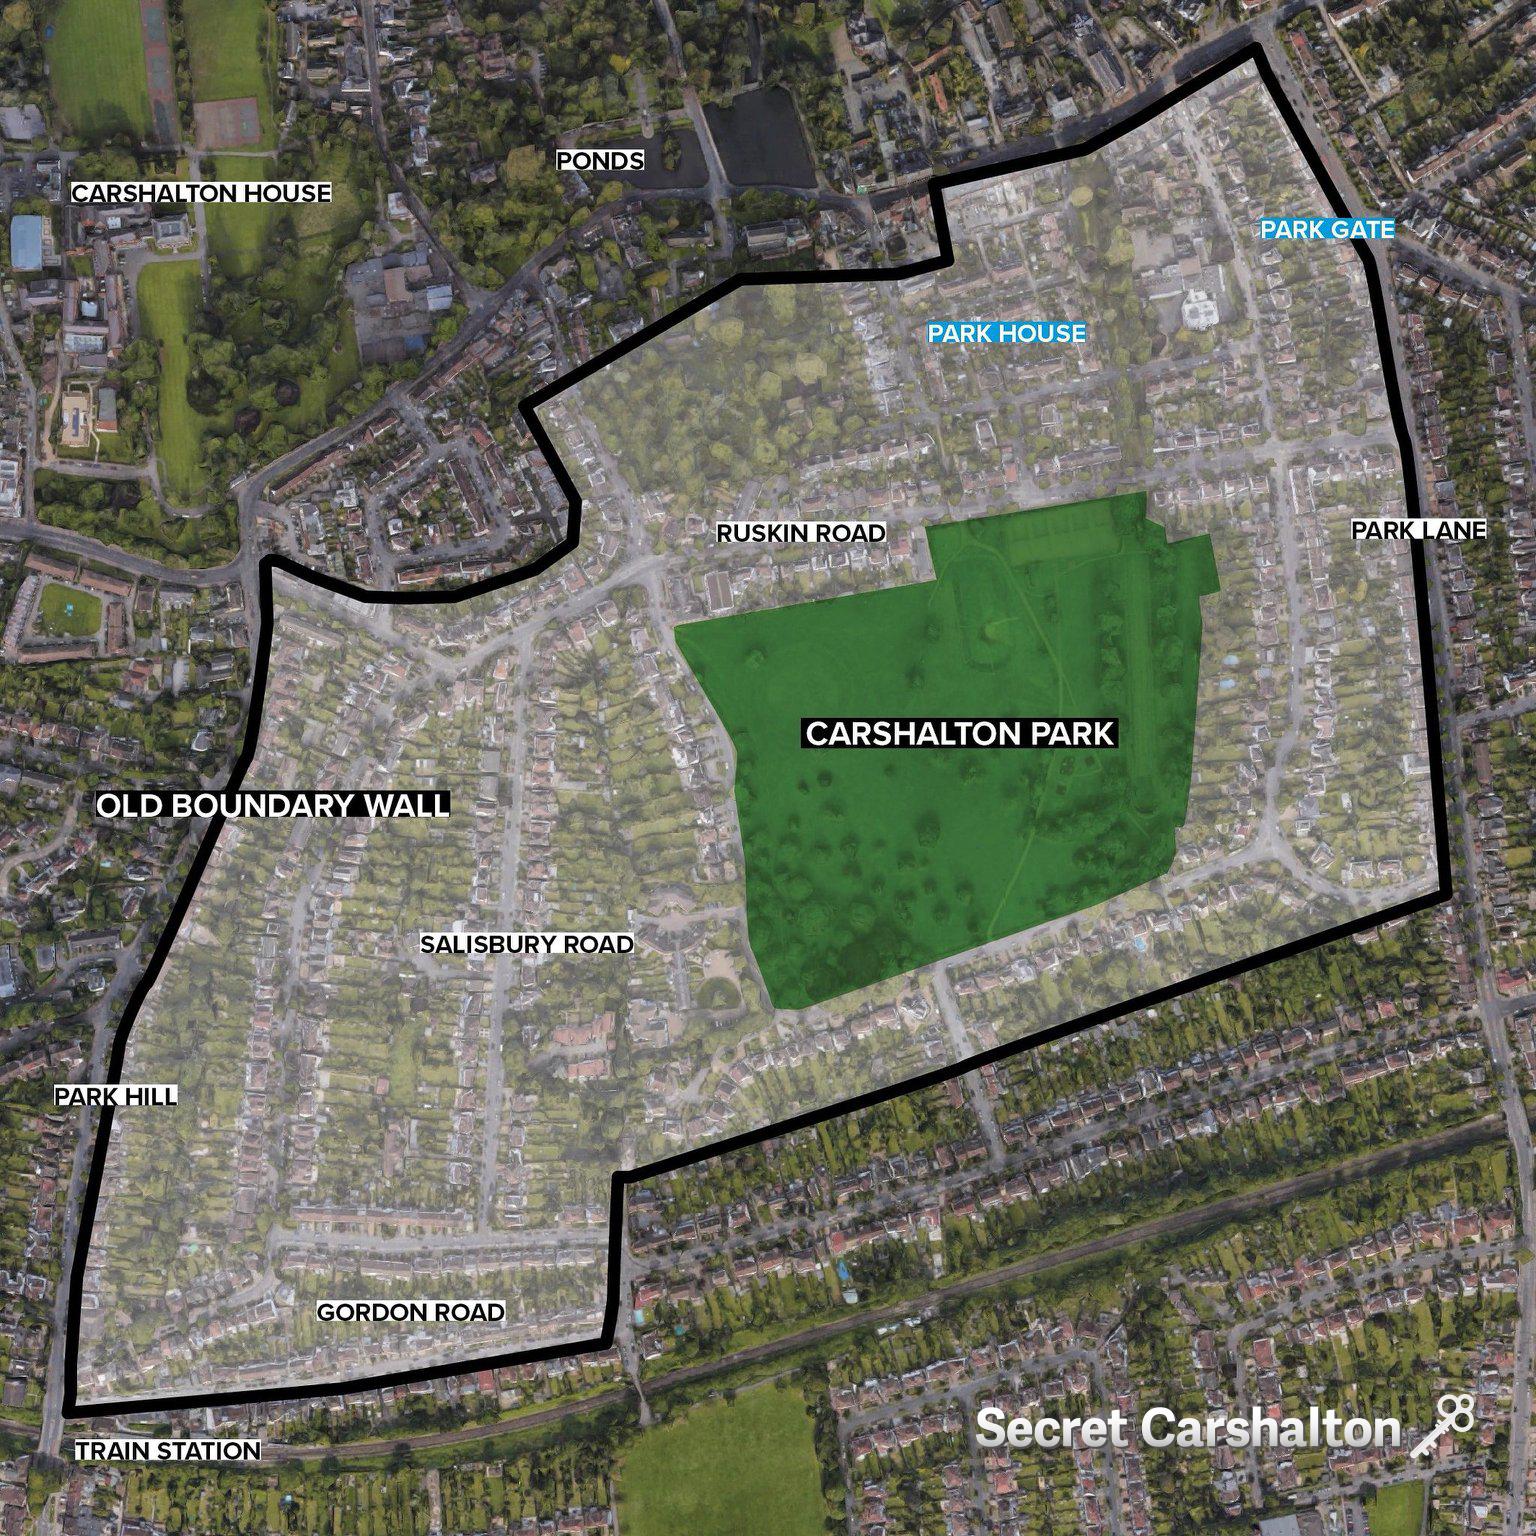 Location of Old Boundary Wall Around Carshalton Park